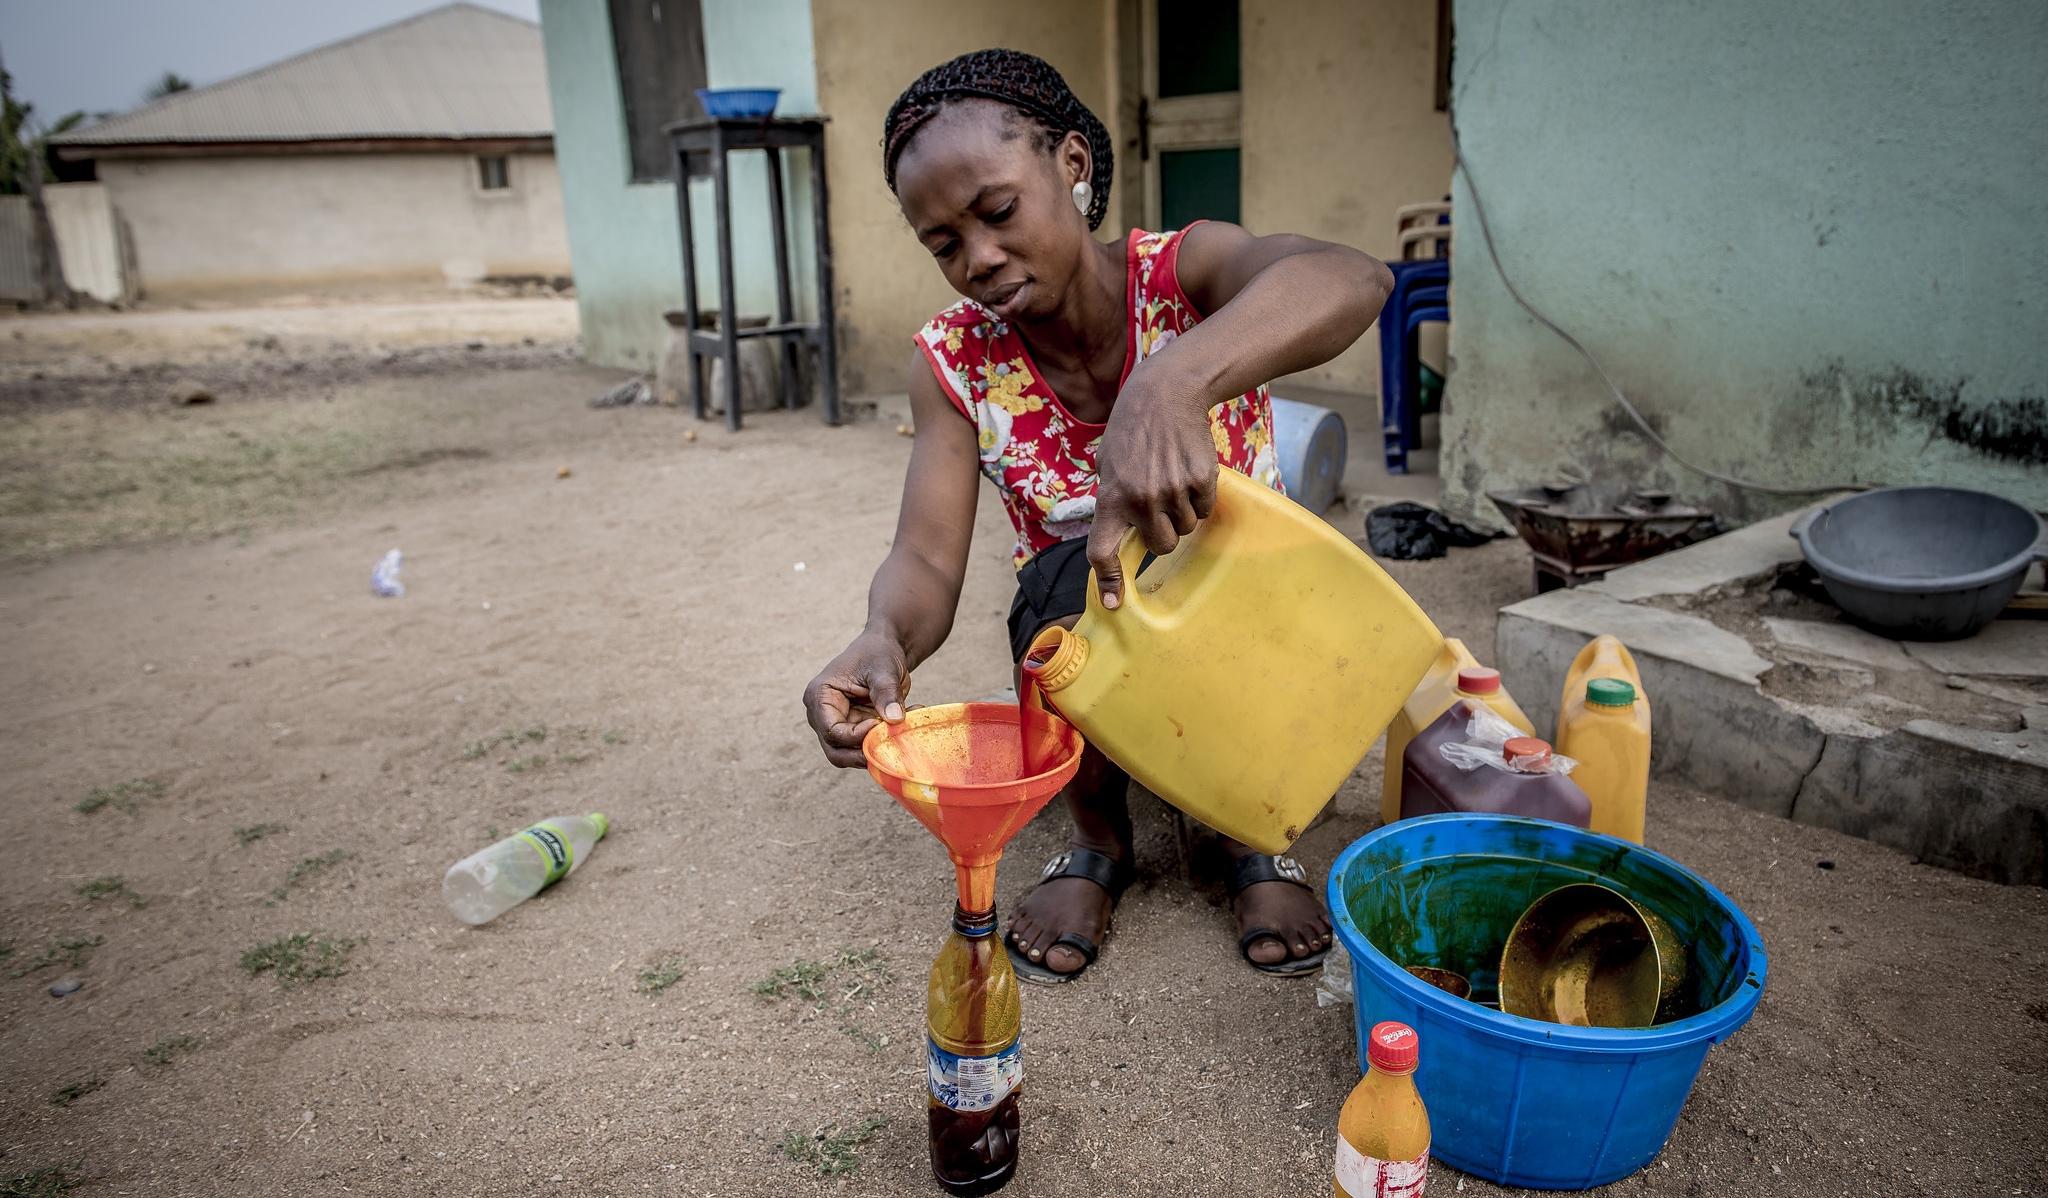 Nigeria's oil curse perpetuates patriarchy